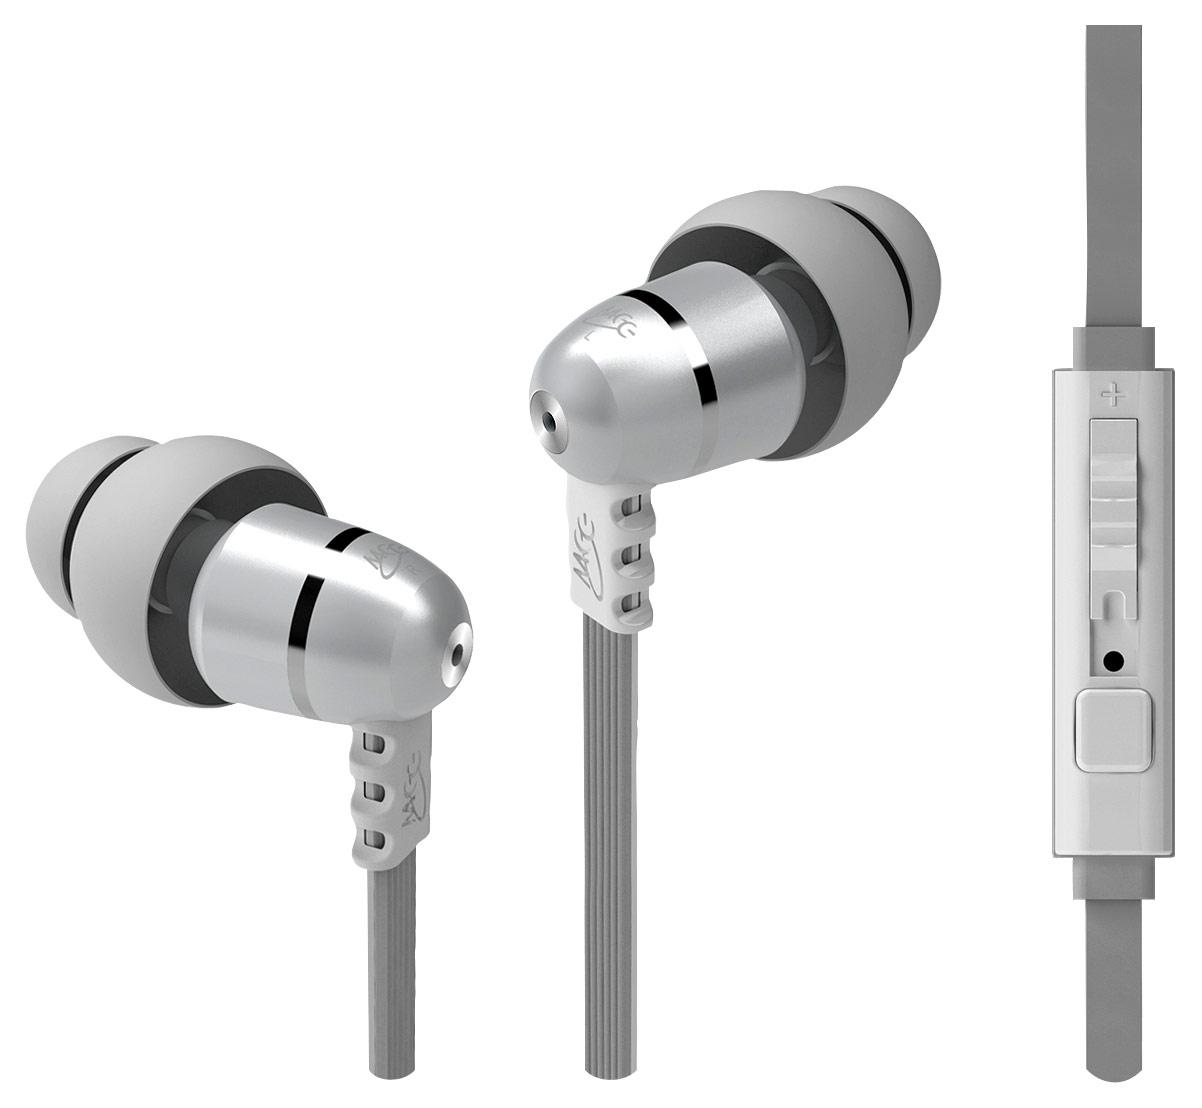 MEElectronics - M9P Earbud Headphones - Pearl